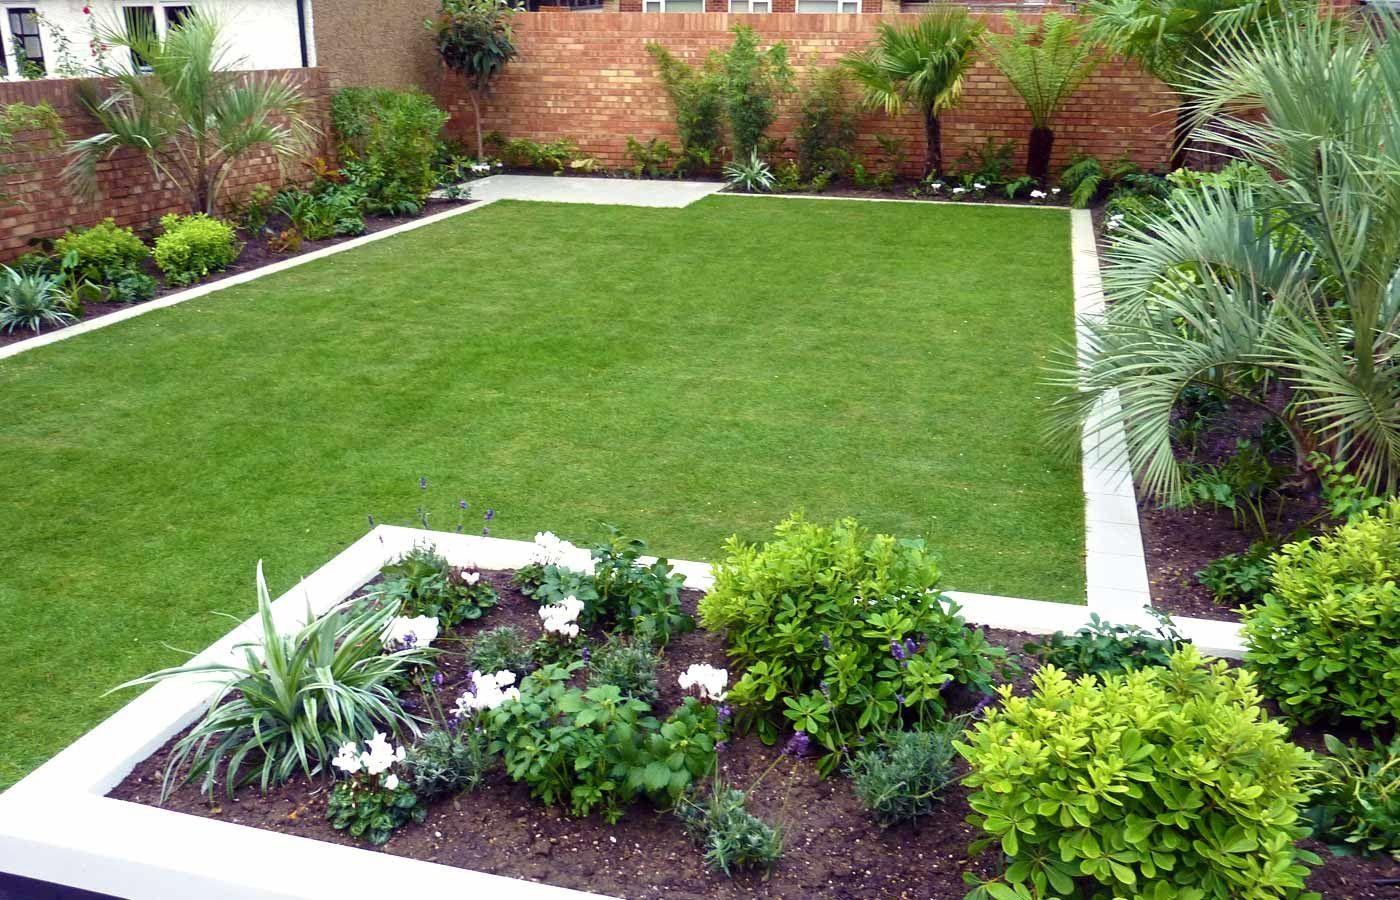 Medium Sized Garden Ideas In 2020 Simple Garden Designs Garden Landscape Design Garden Design Layout